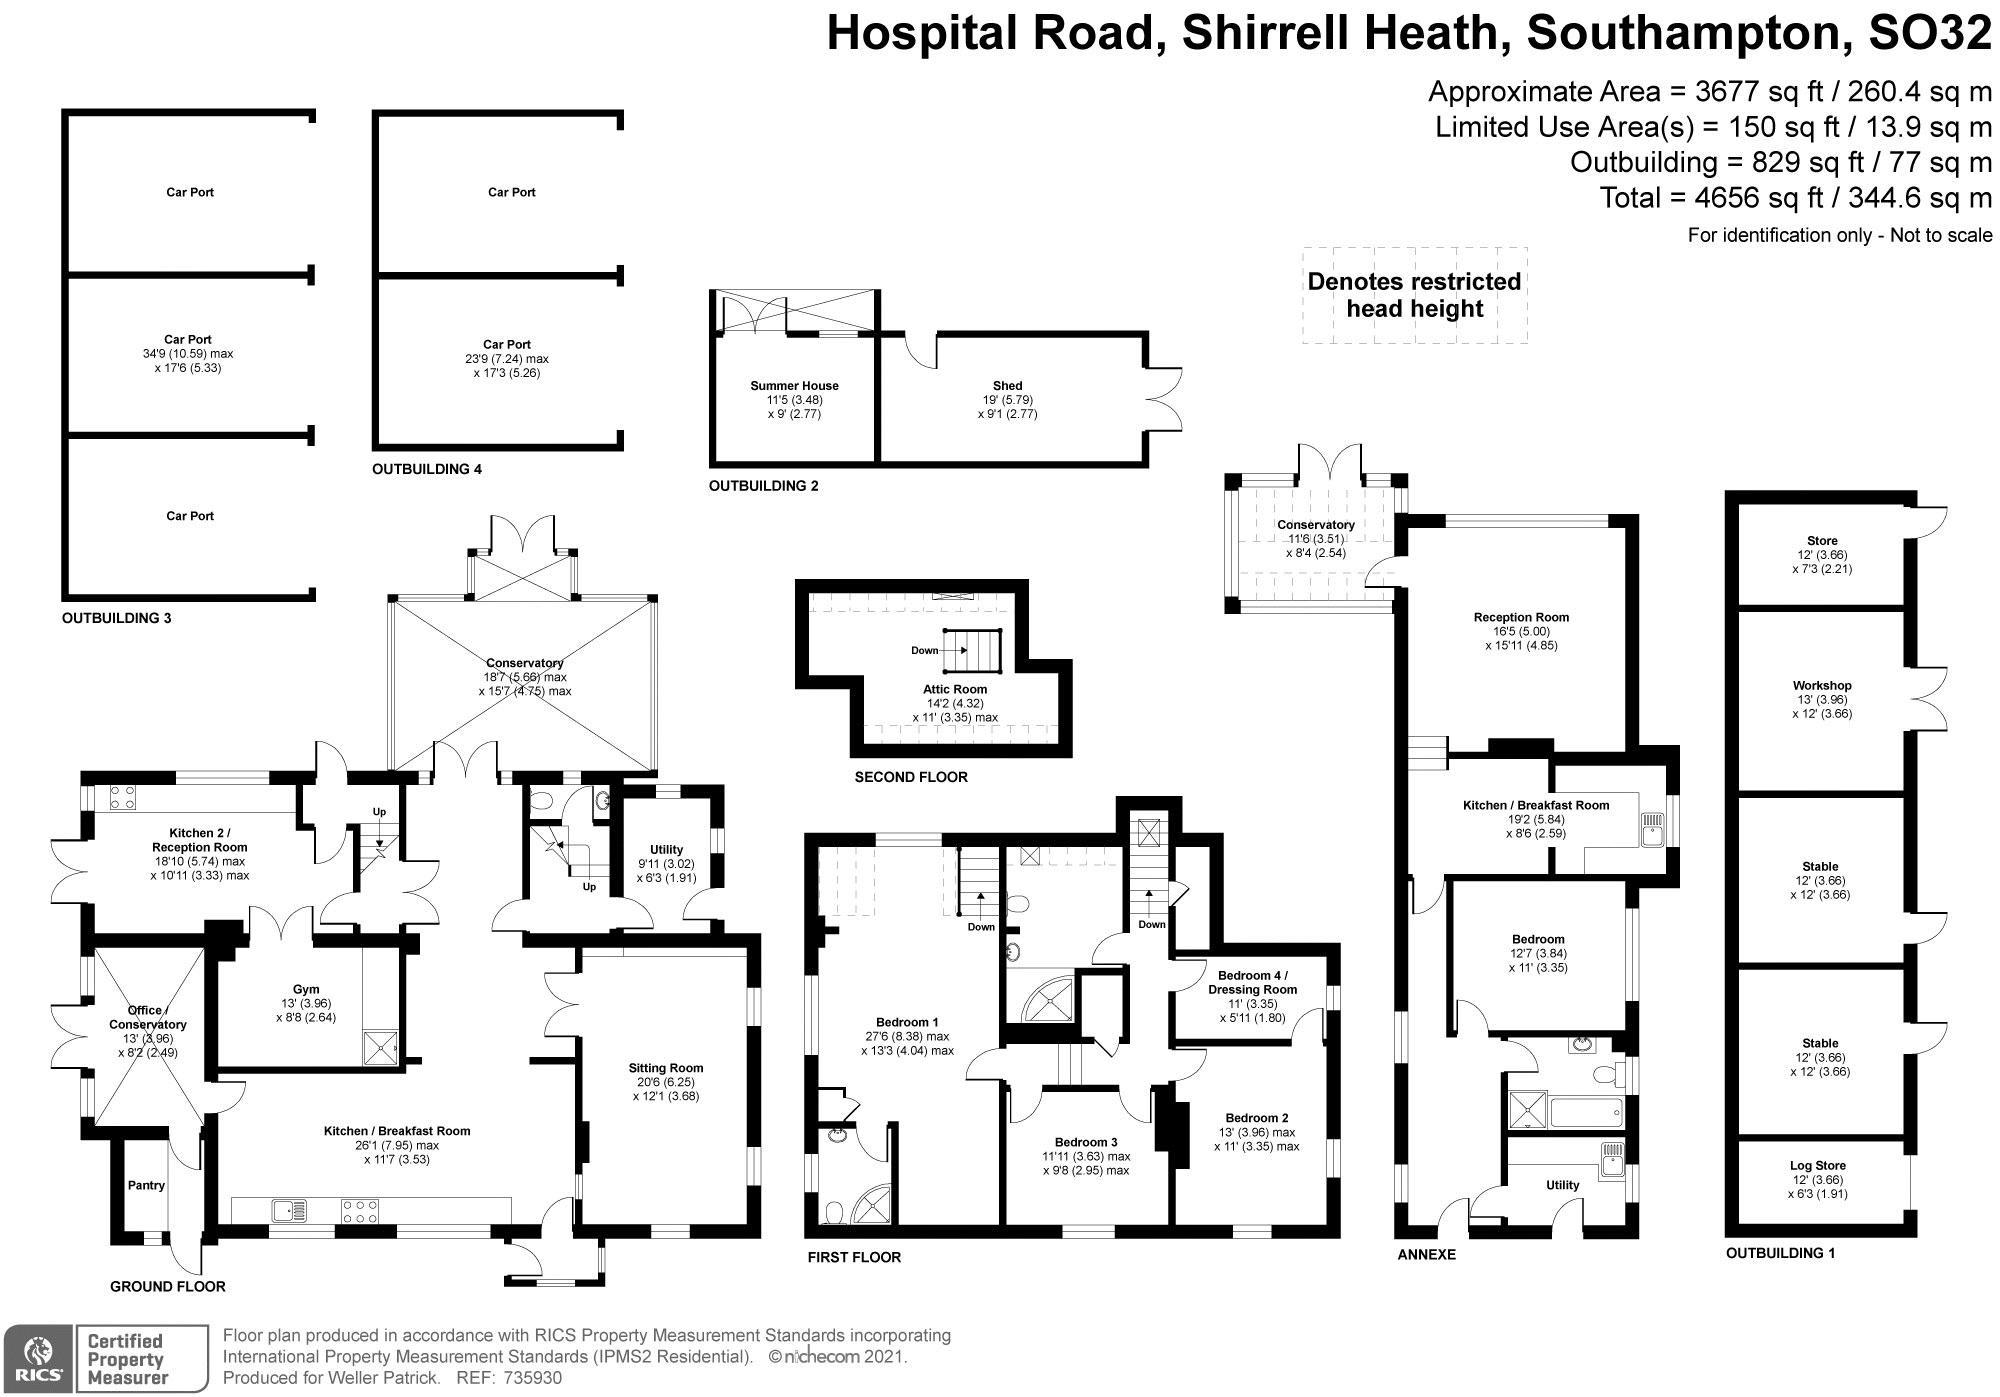 Hospital Road Shirrell Heath